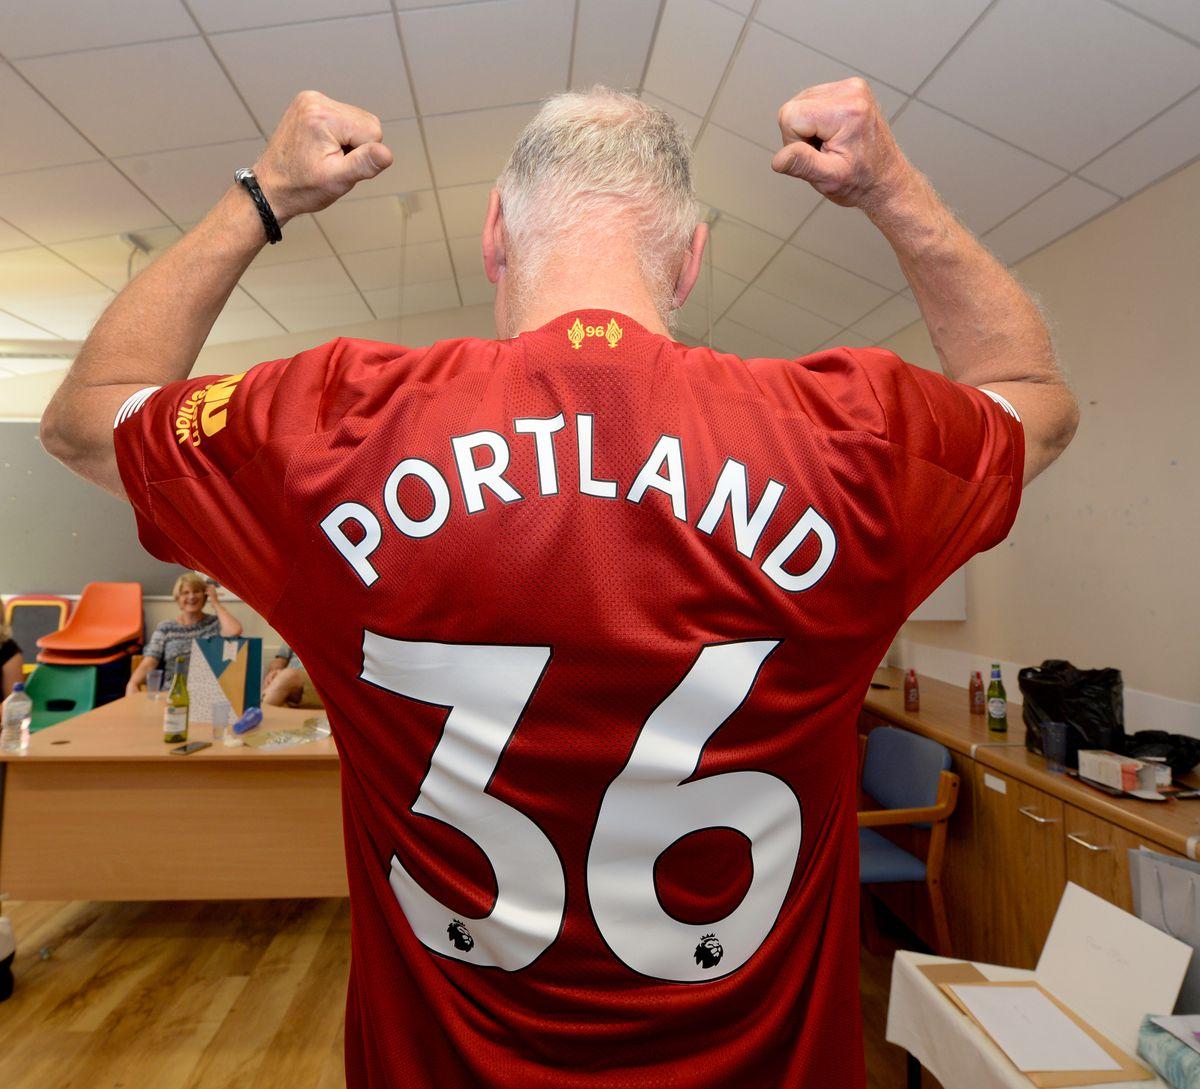 Dr Flenley's special retirement Liverpool shirt